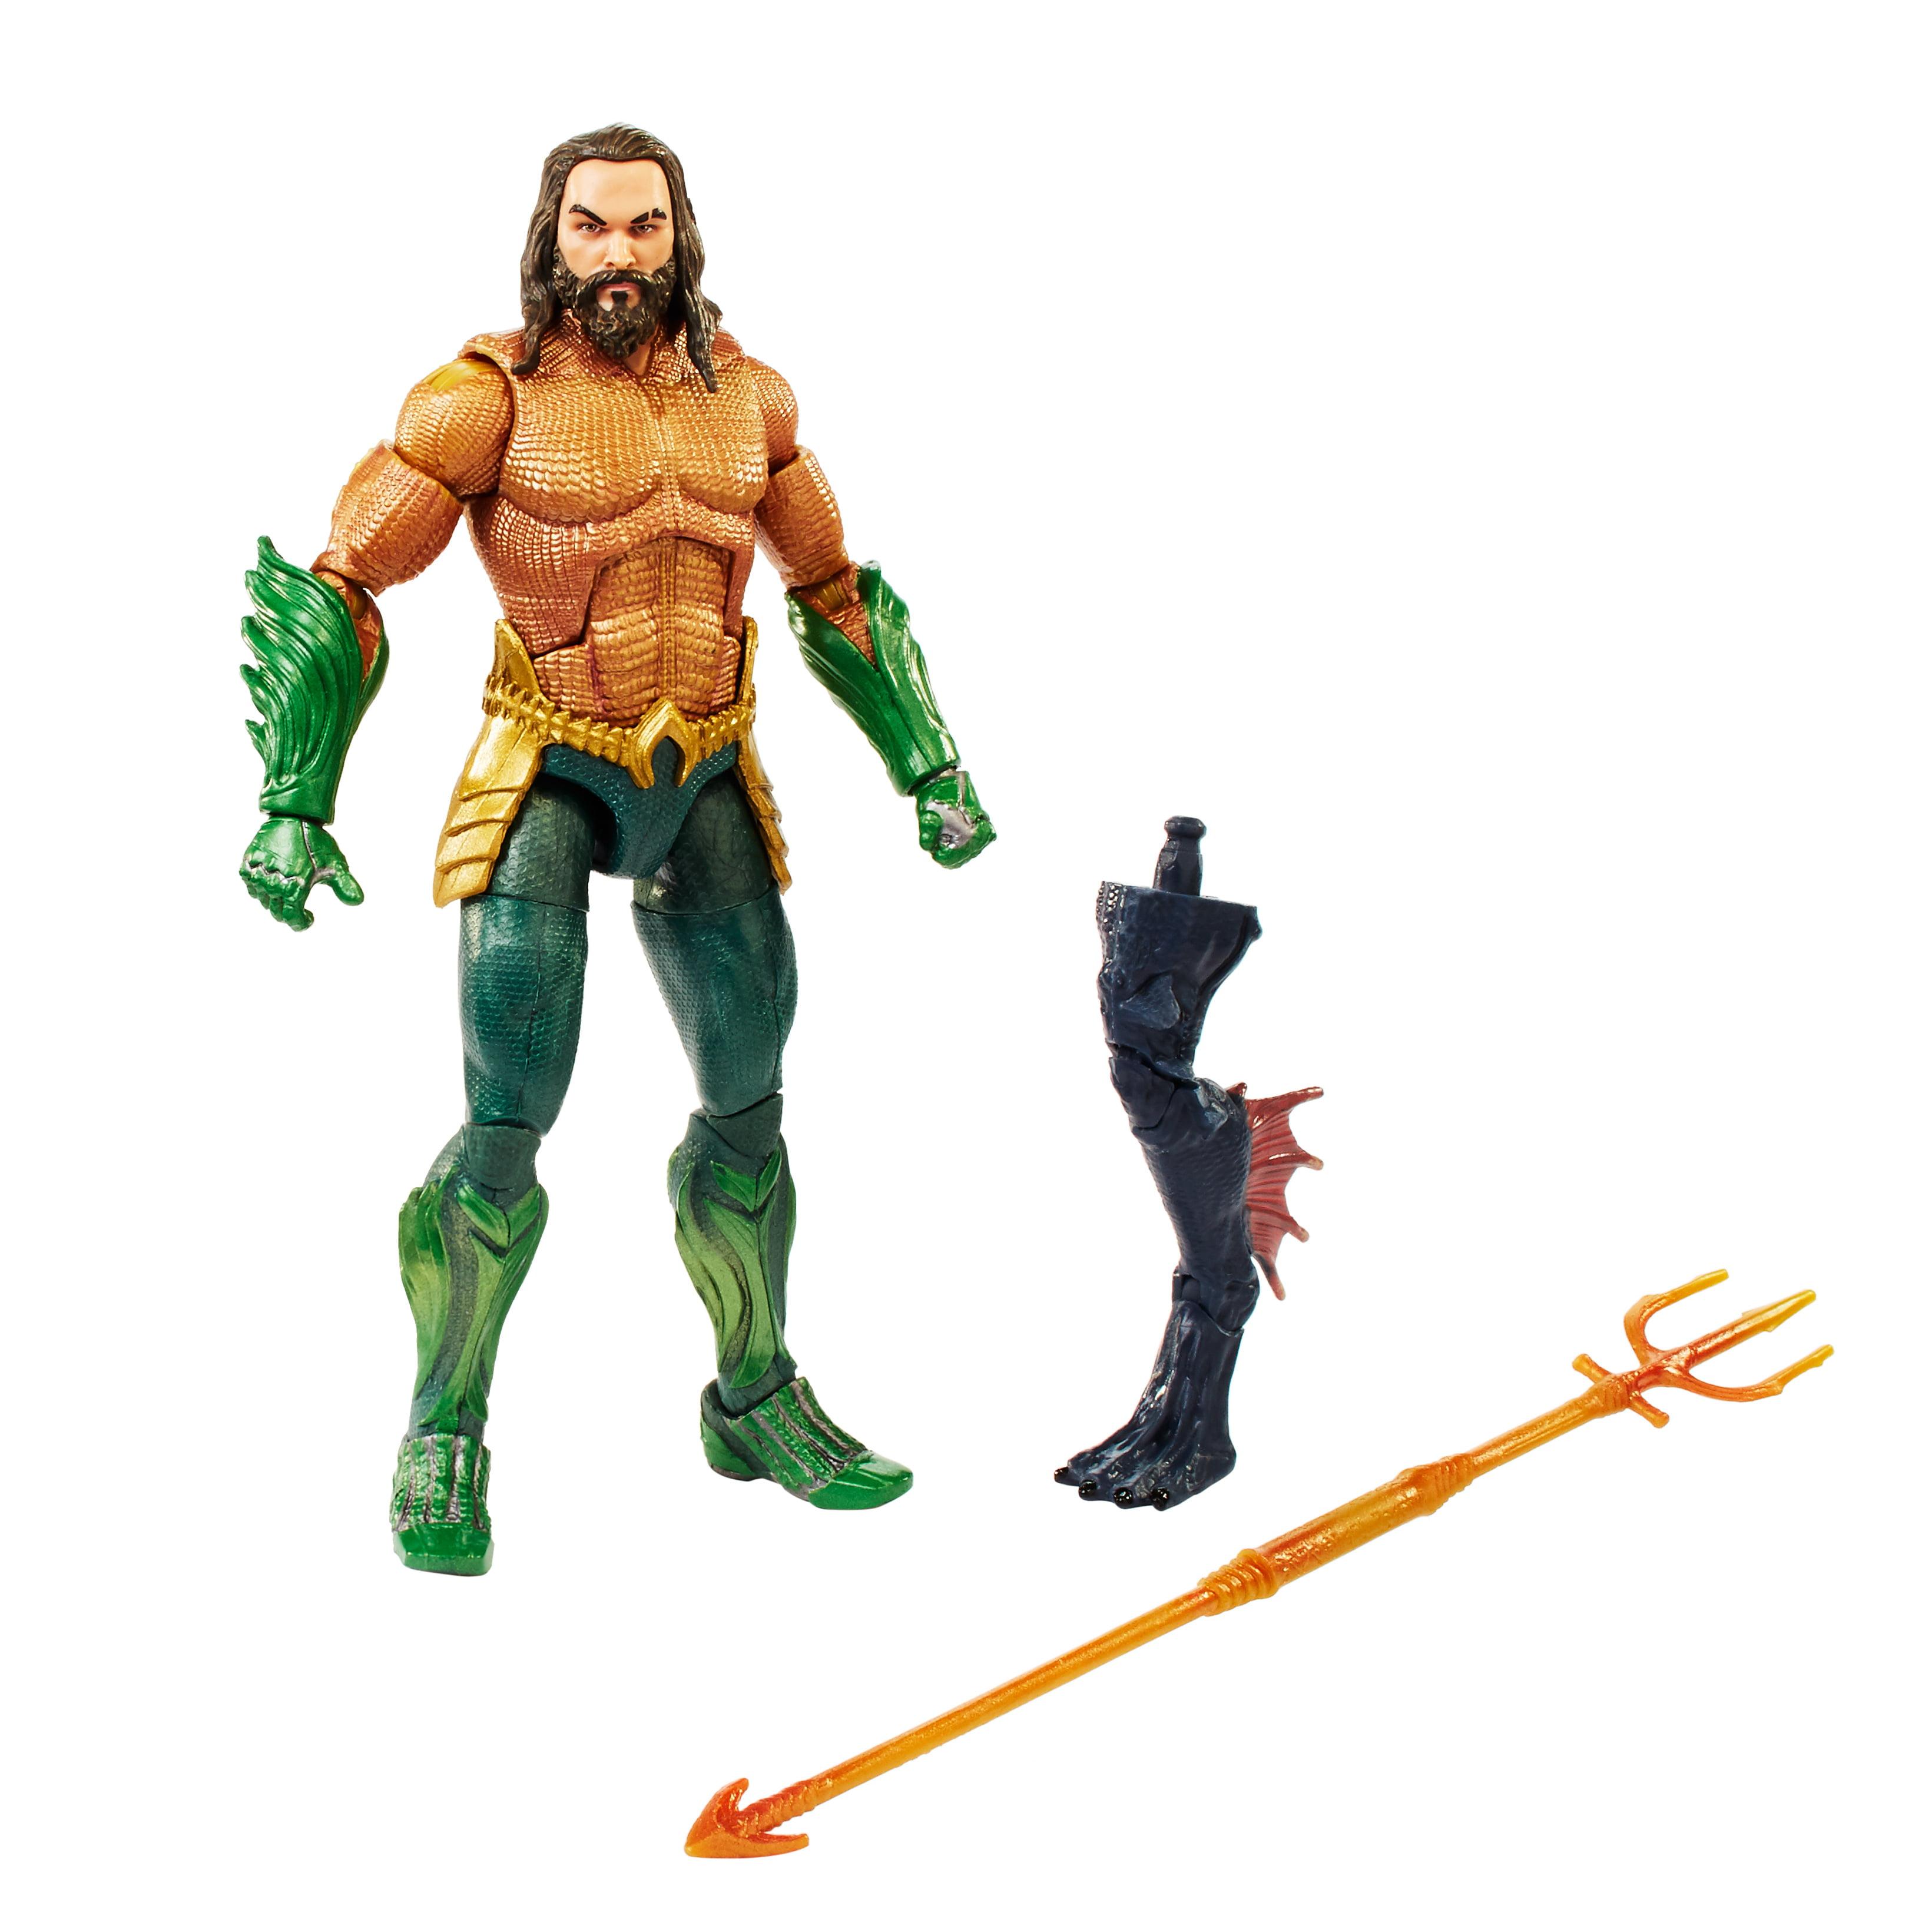 DC Comics Multiverse Aquaman Movie Figure Assortment